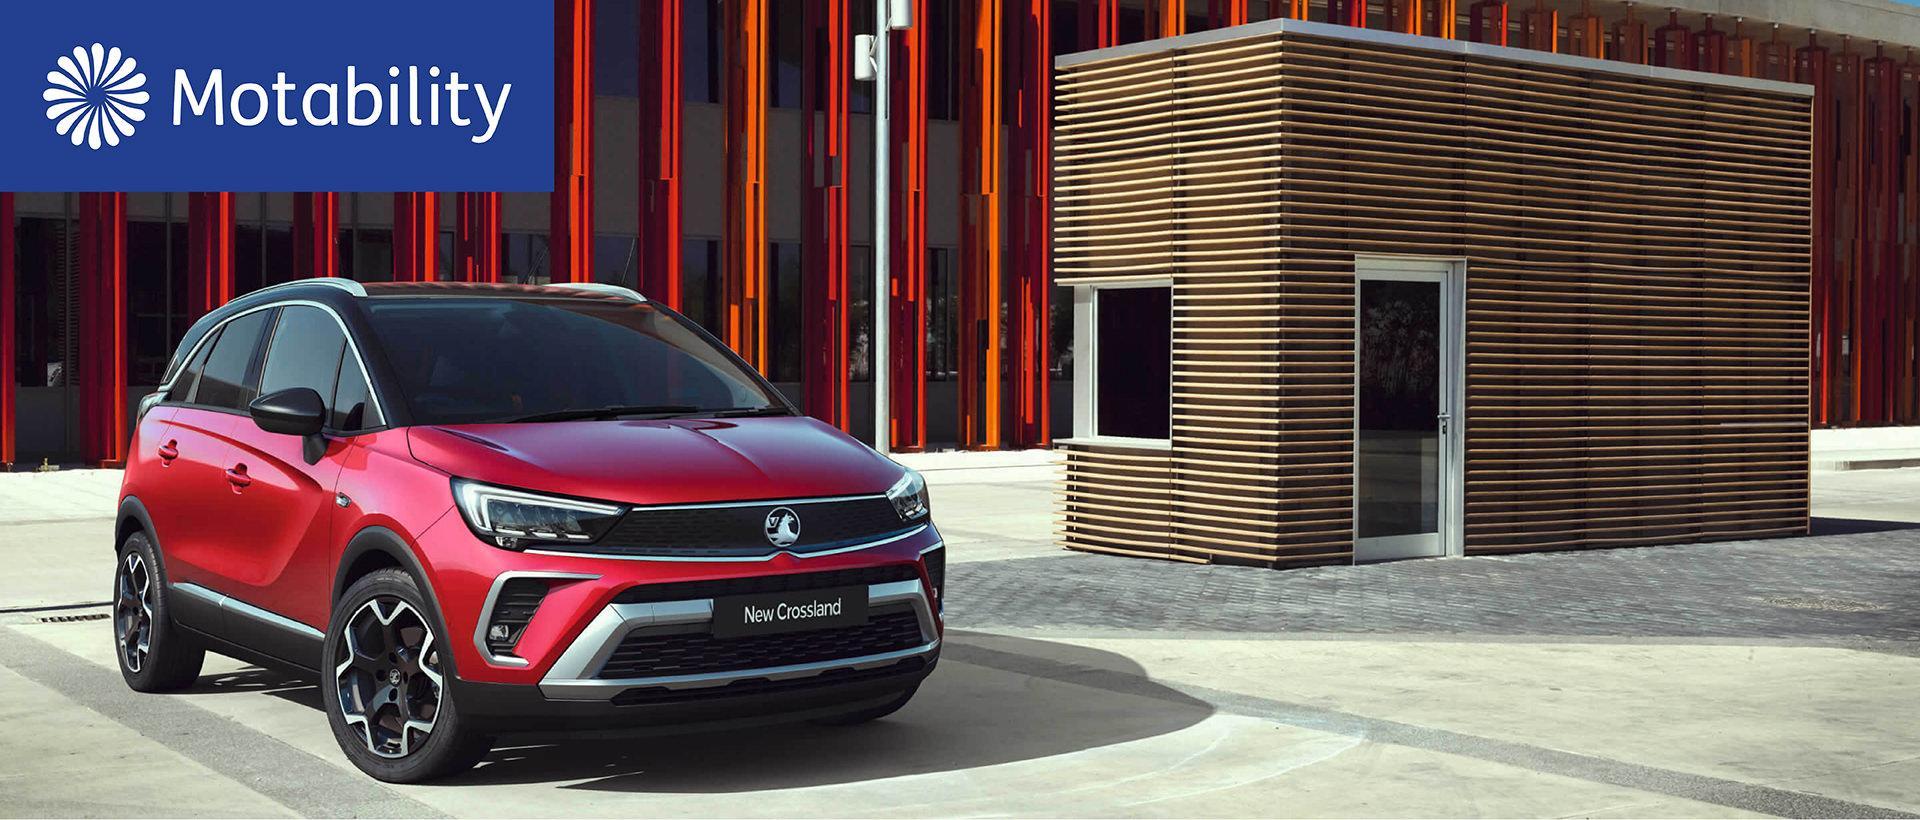 Vauxhall Crossland Motability Offers